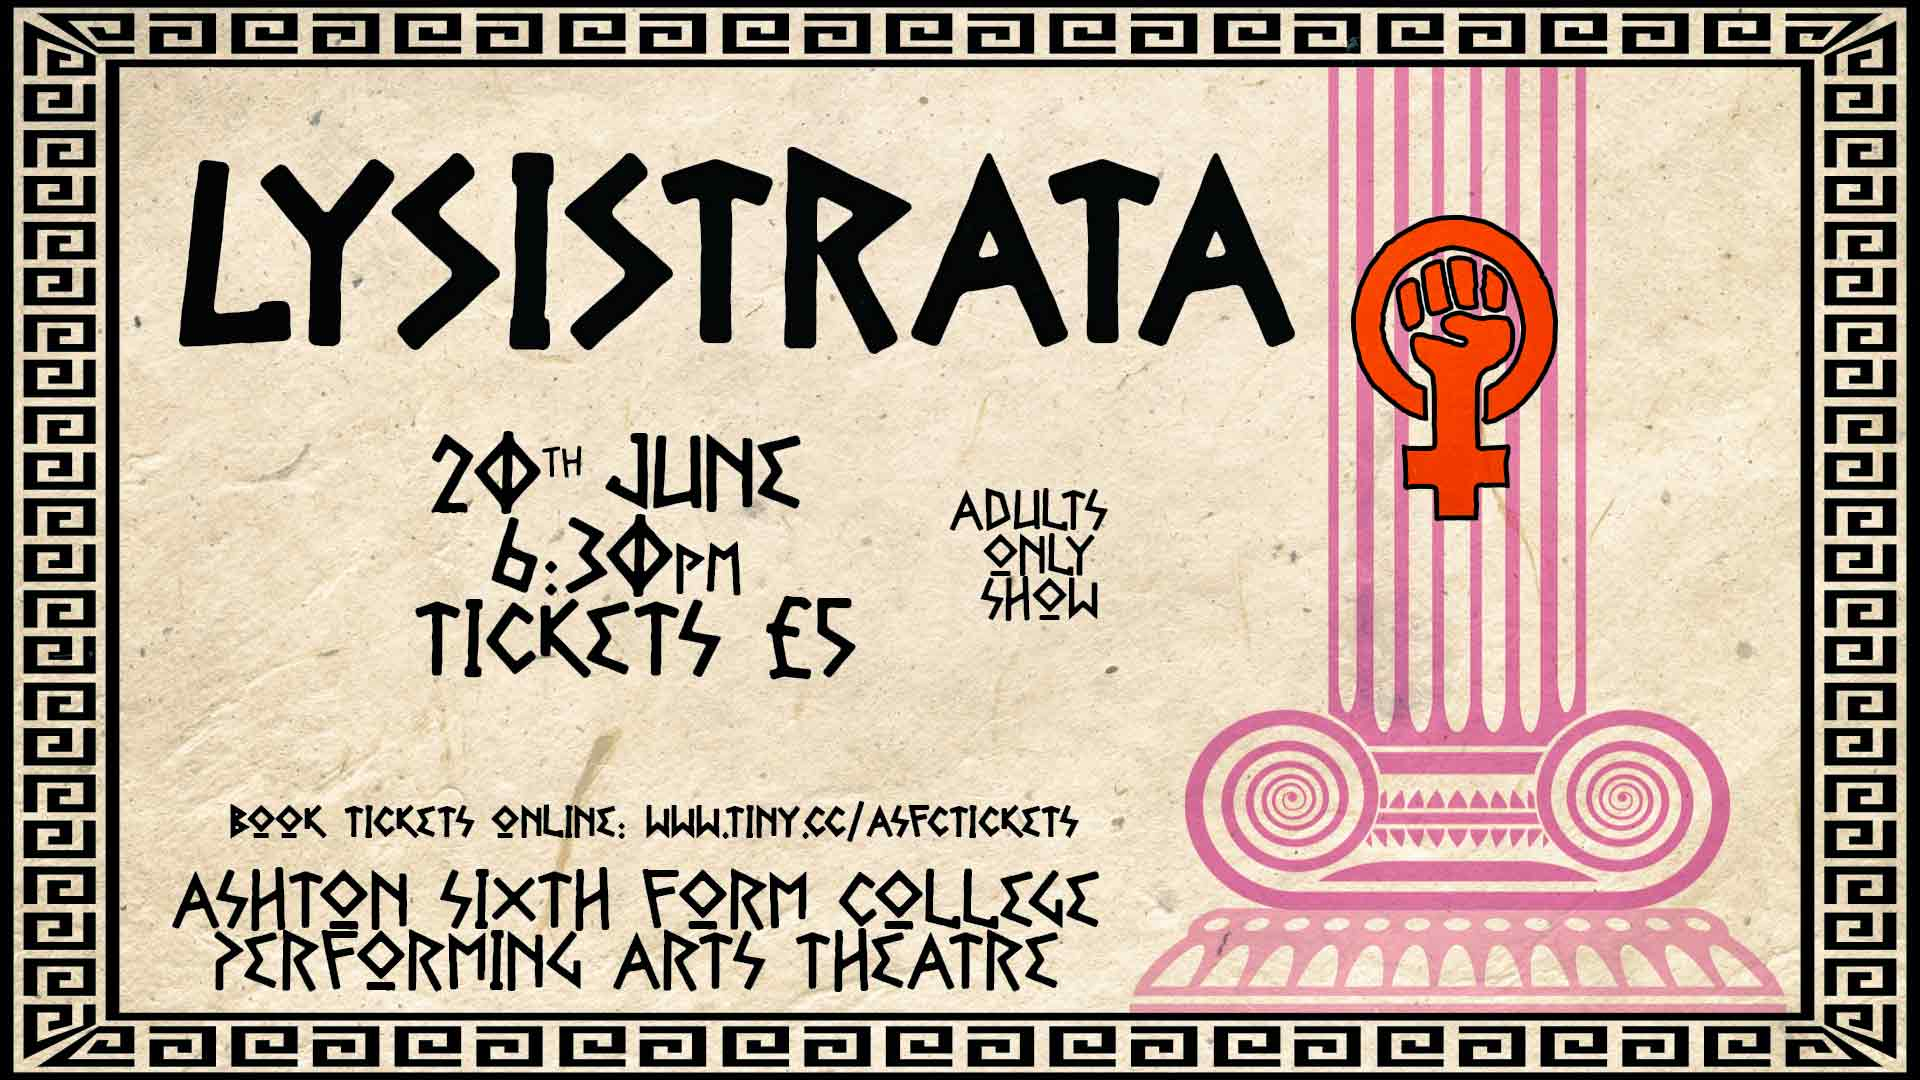 Lysistrata banner image